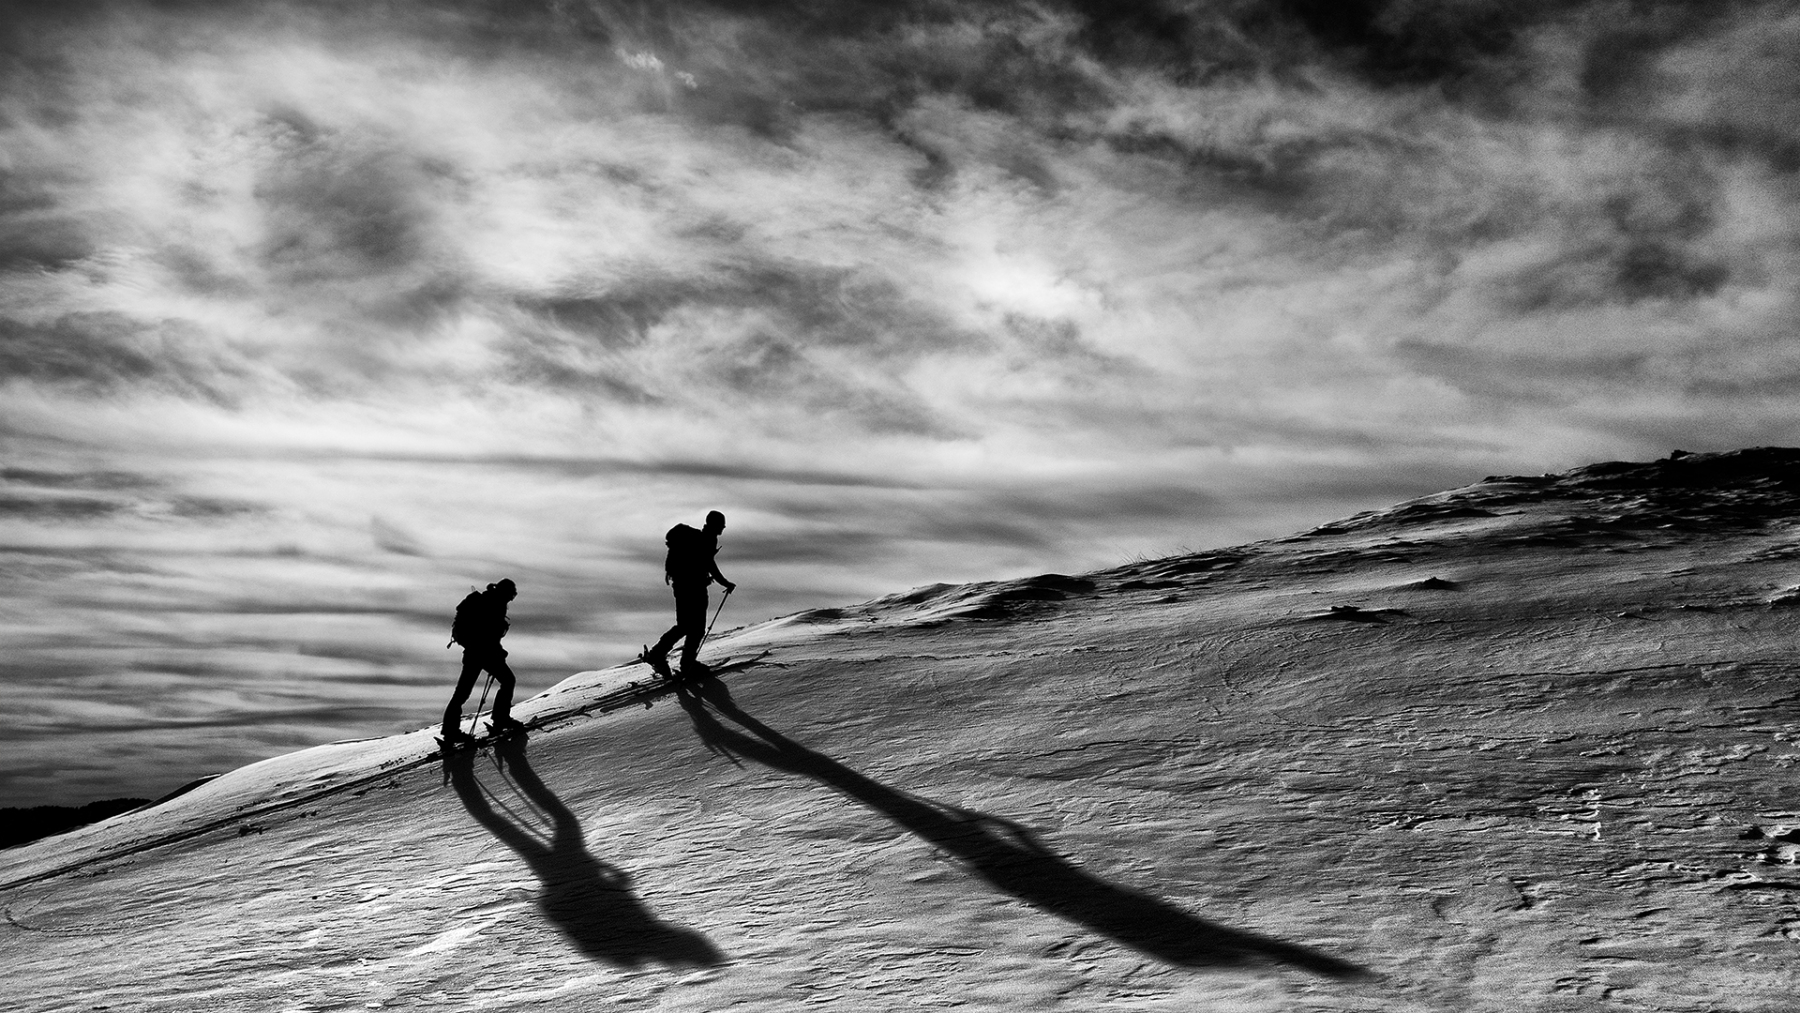 Step by step – Rakúsko, Wetterin, 2014